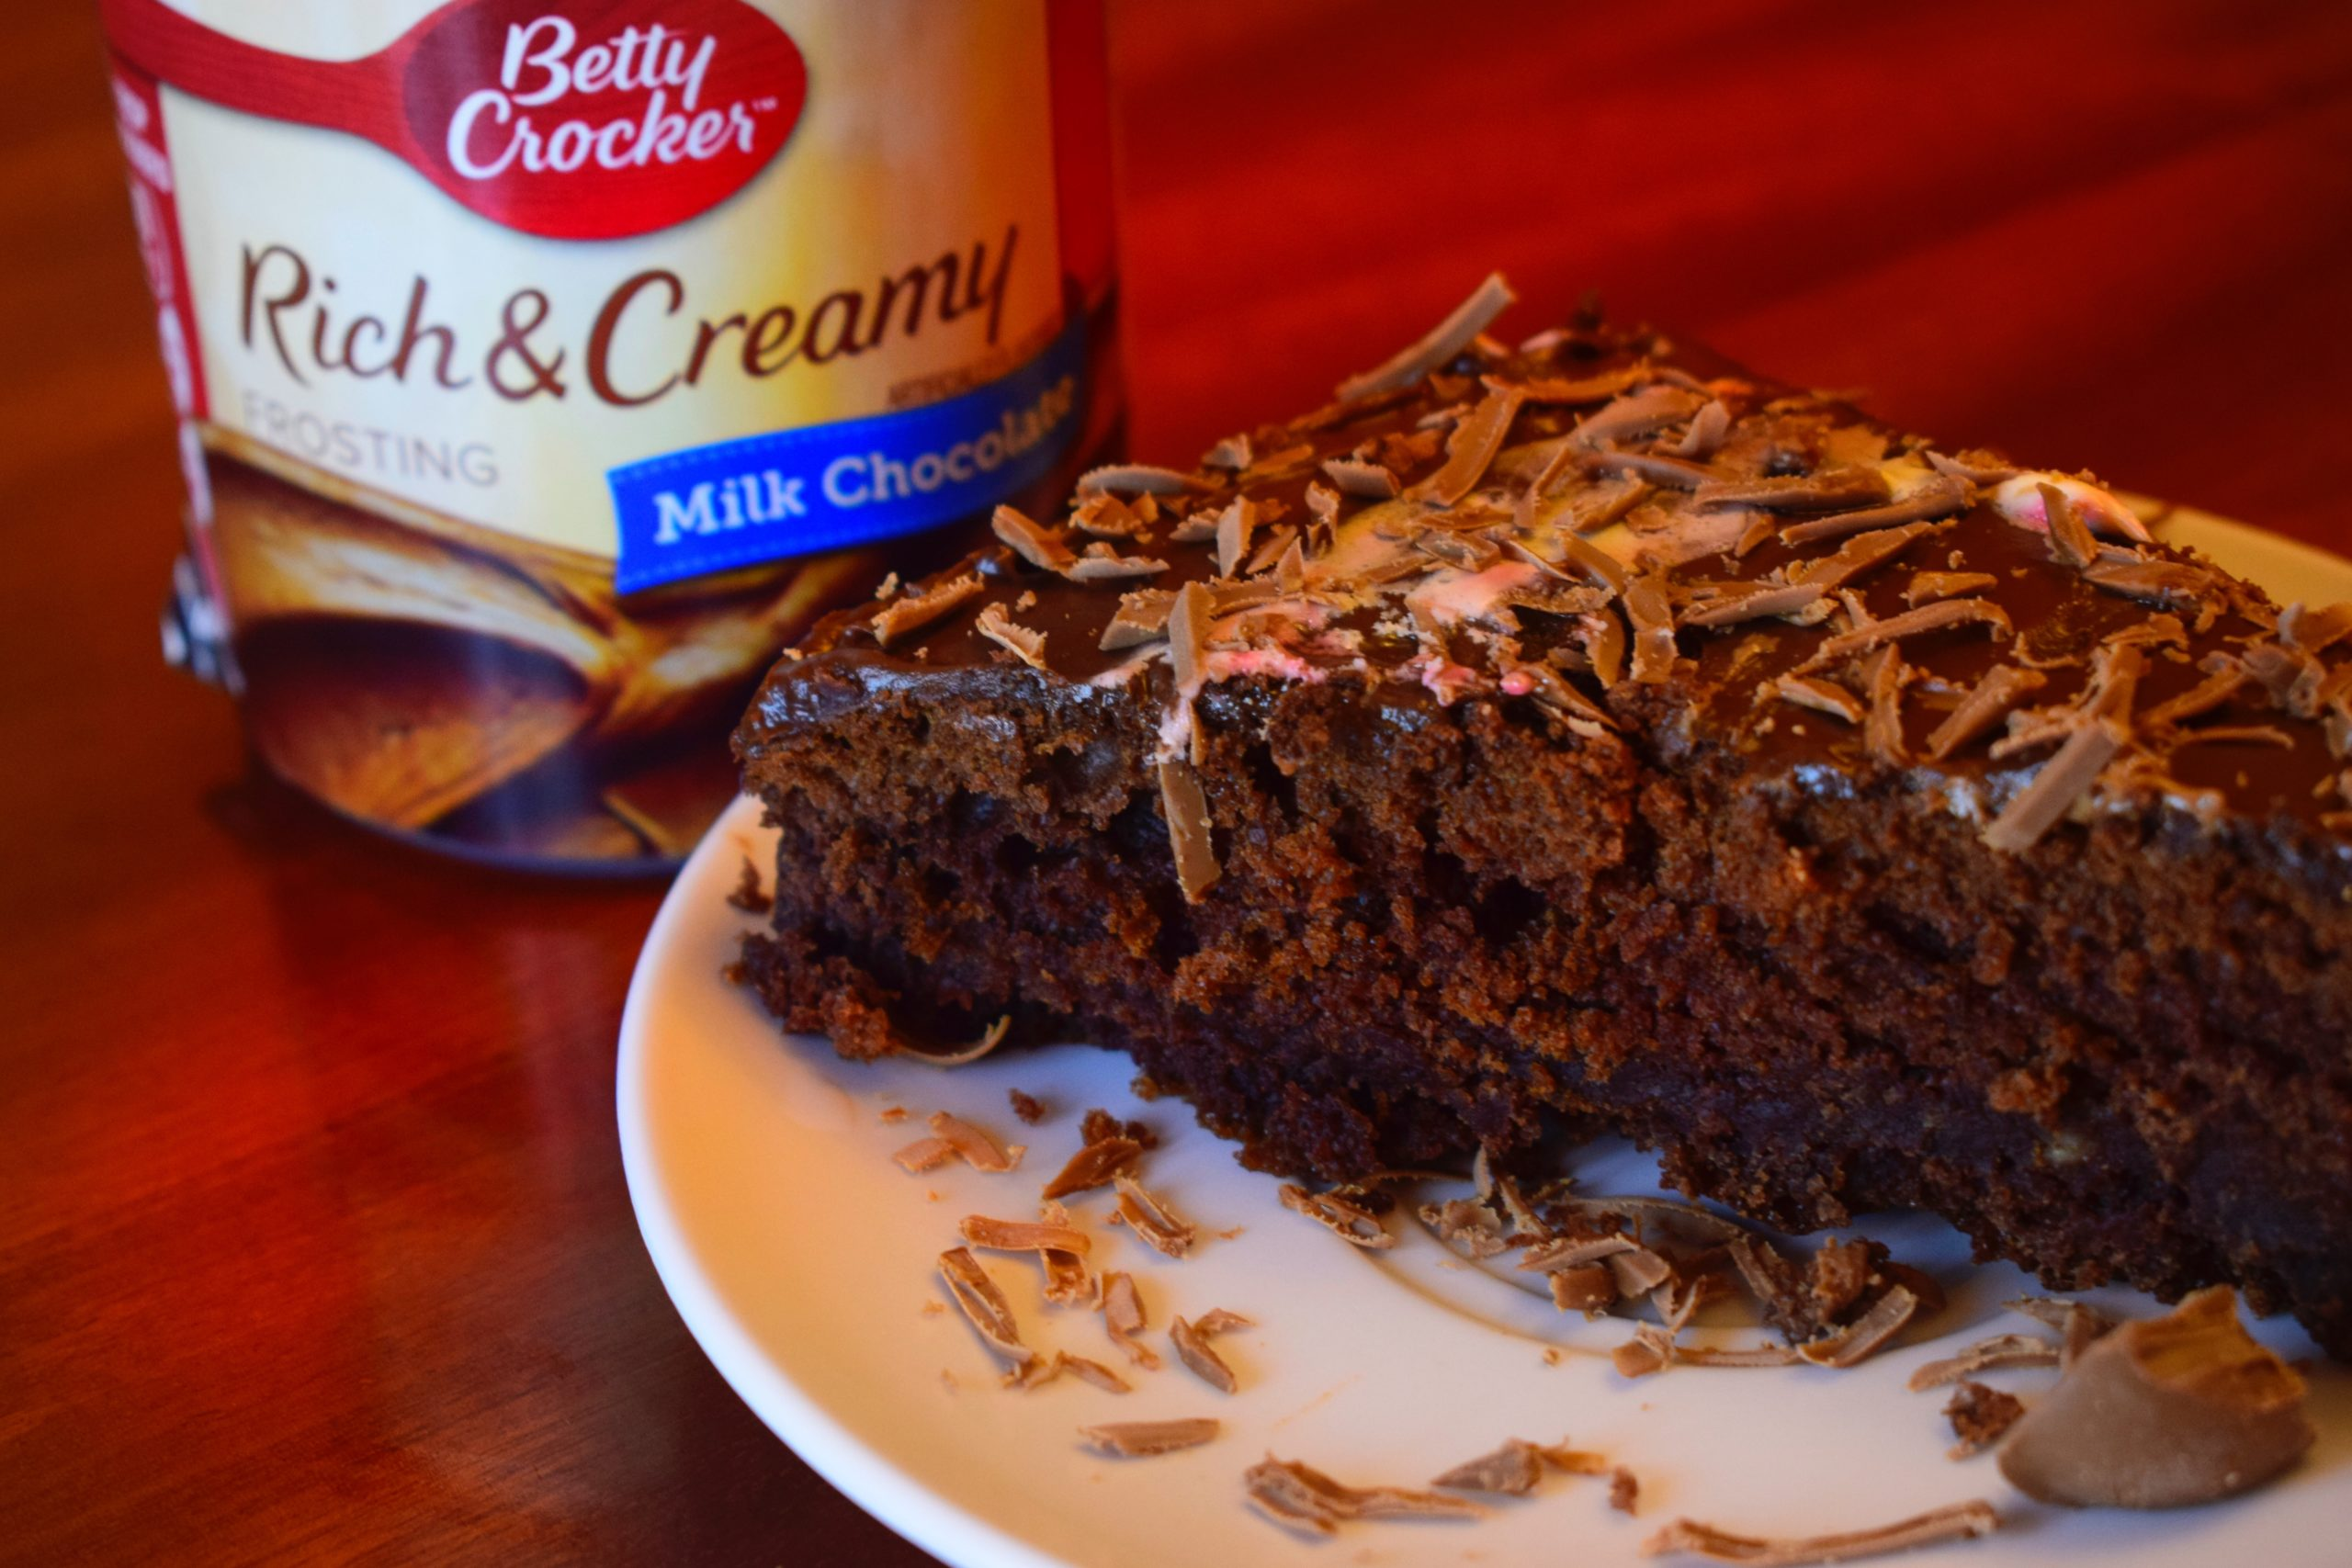 EASY STEP BY STEP CHOCOLATE CAKE RECIPE